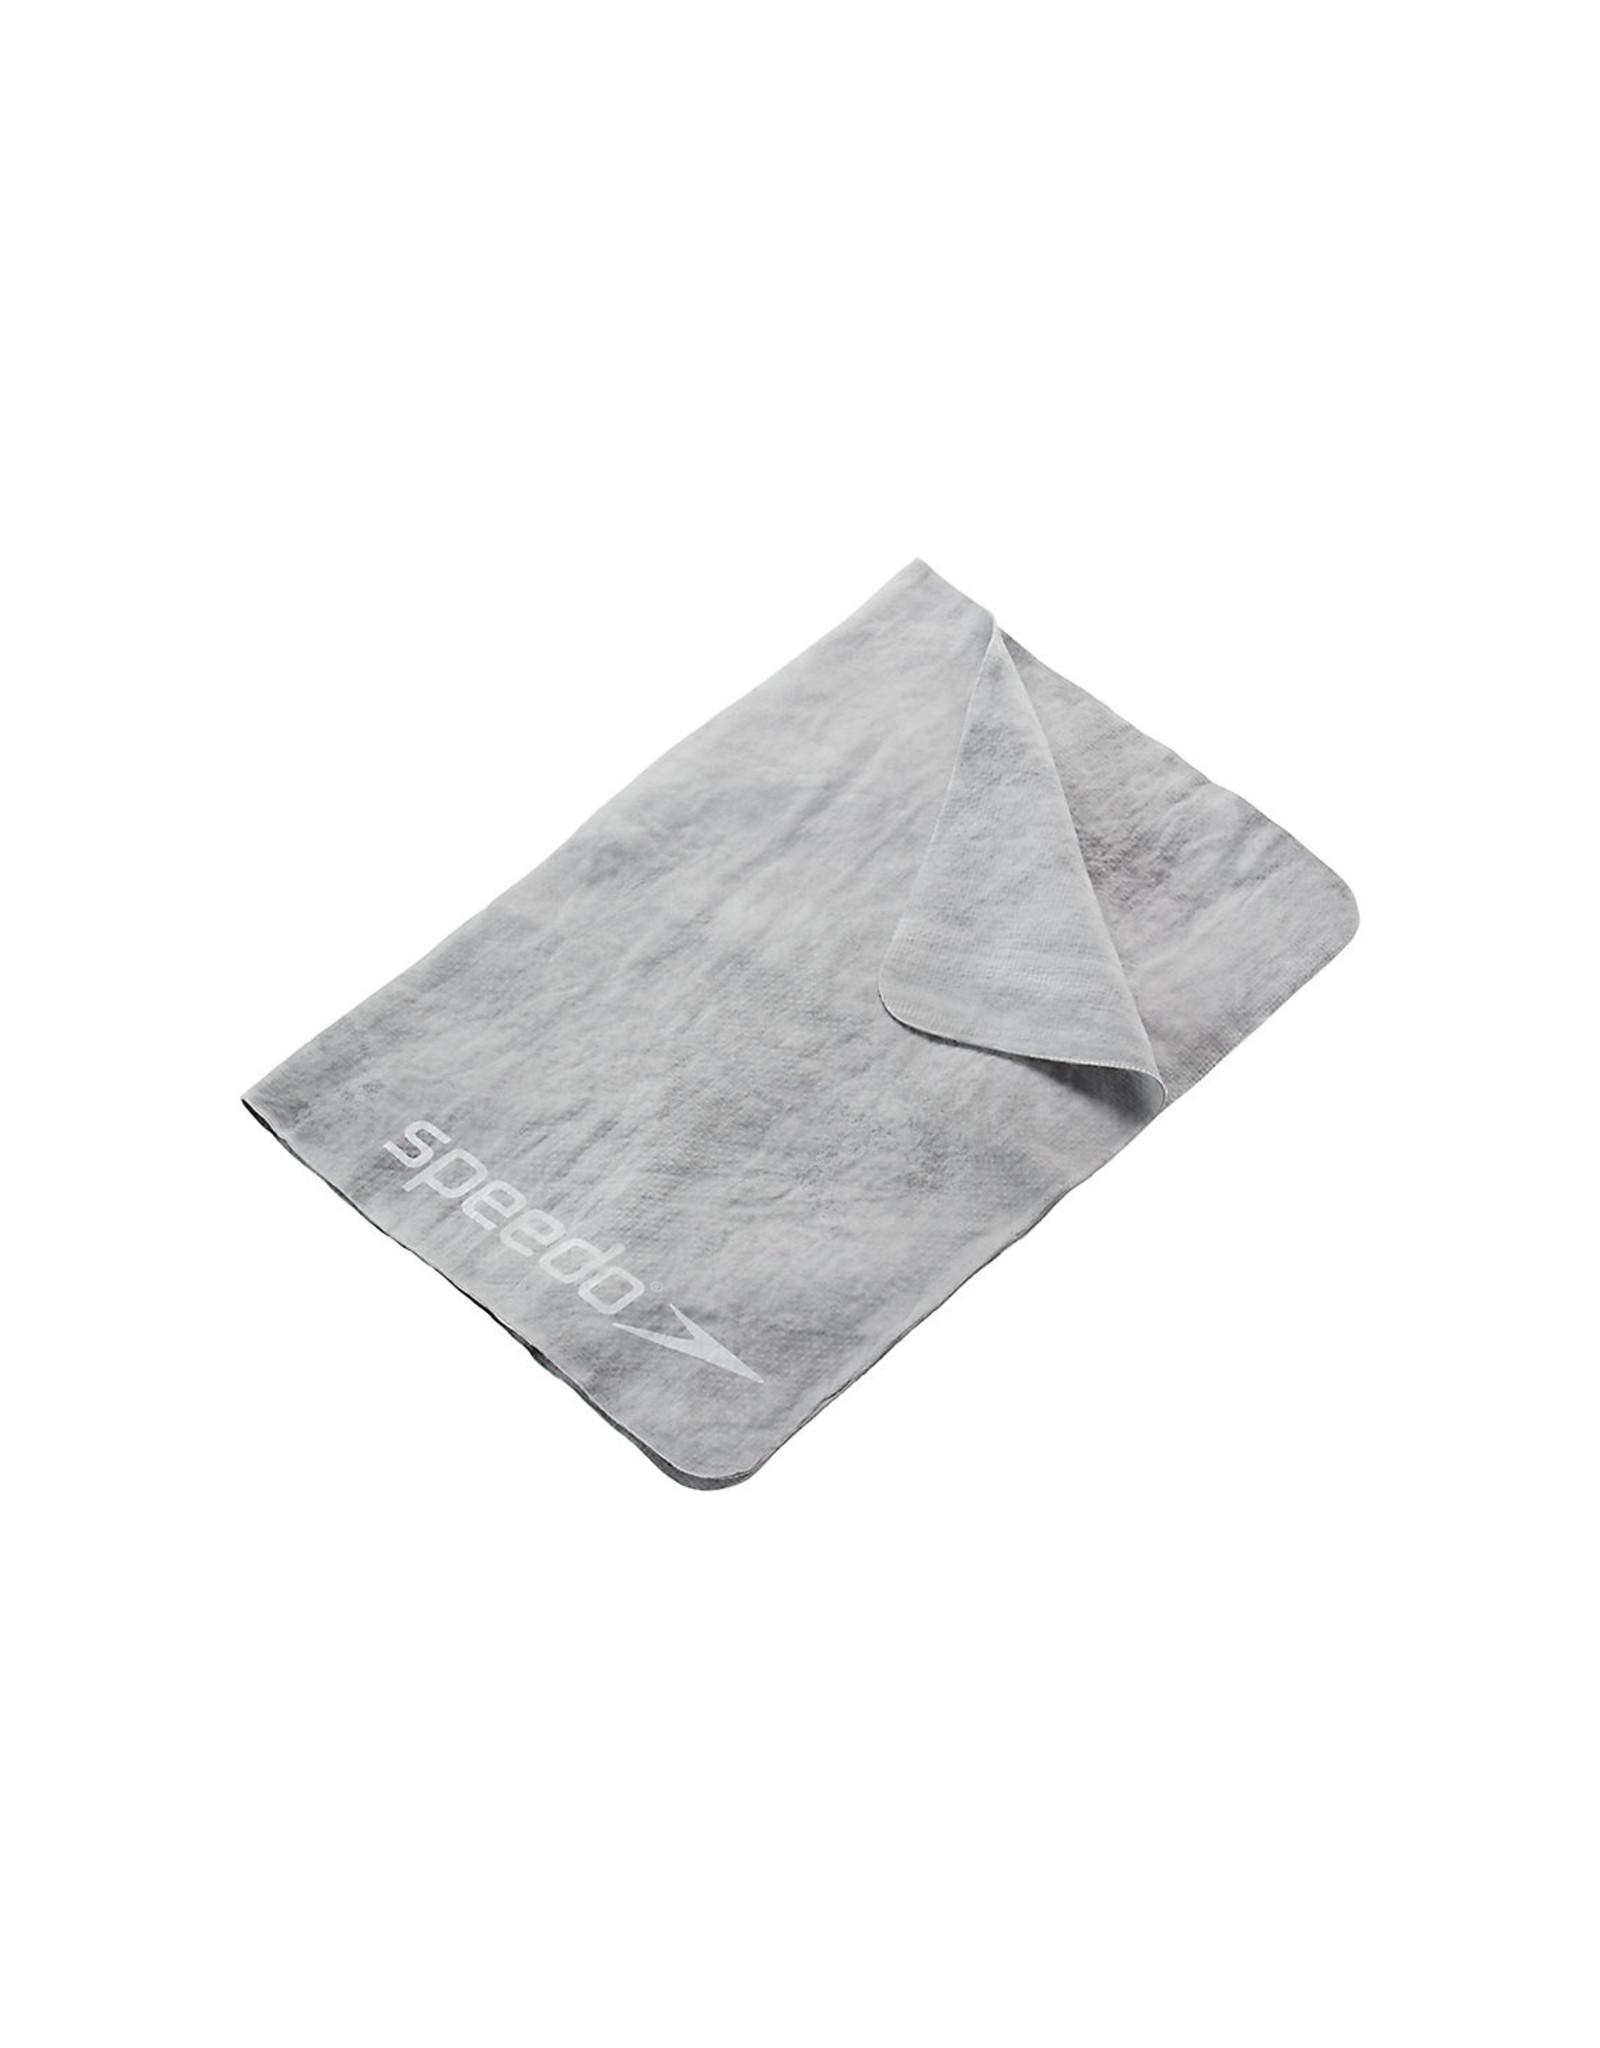 SPEEDO SPEEDO SPORTS TOWEL